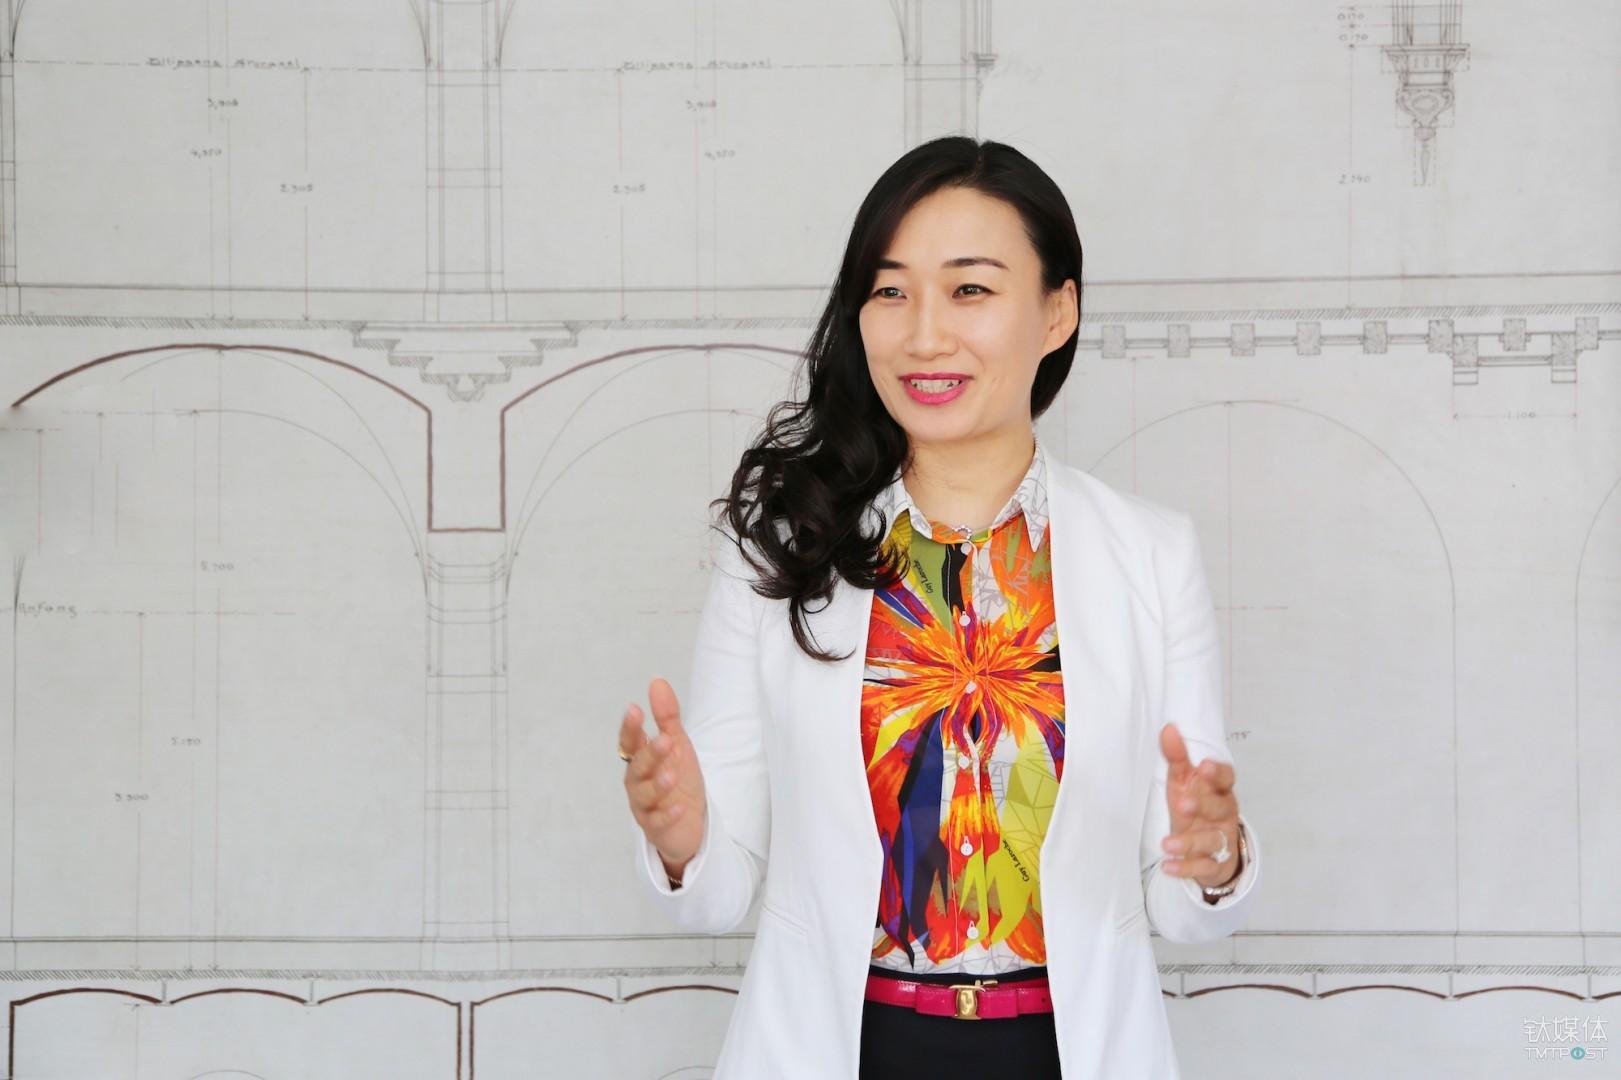 Feng Zhongqian, standing vice manager of Information Management Center of Wanda Group